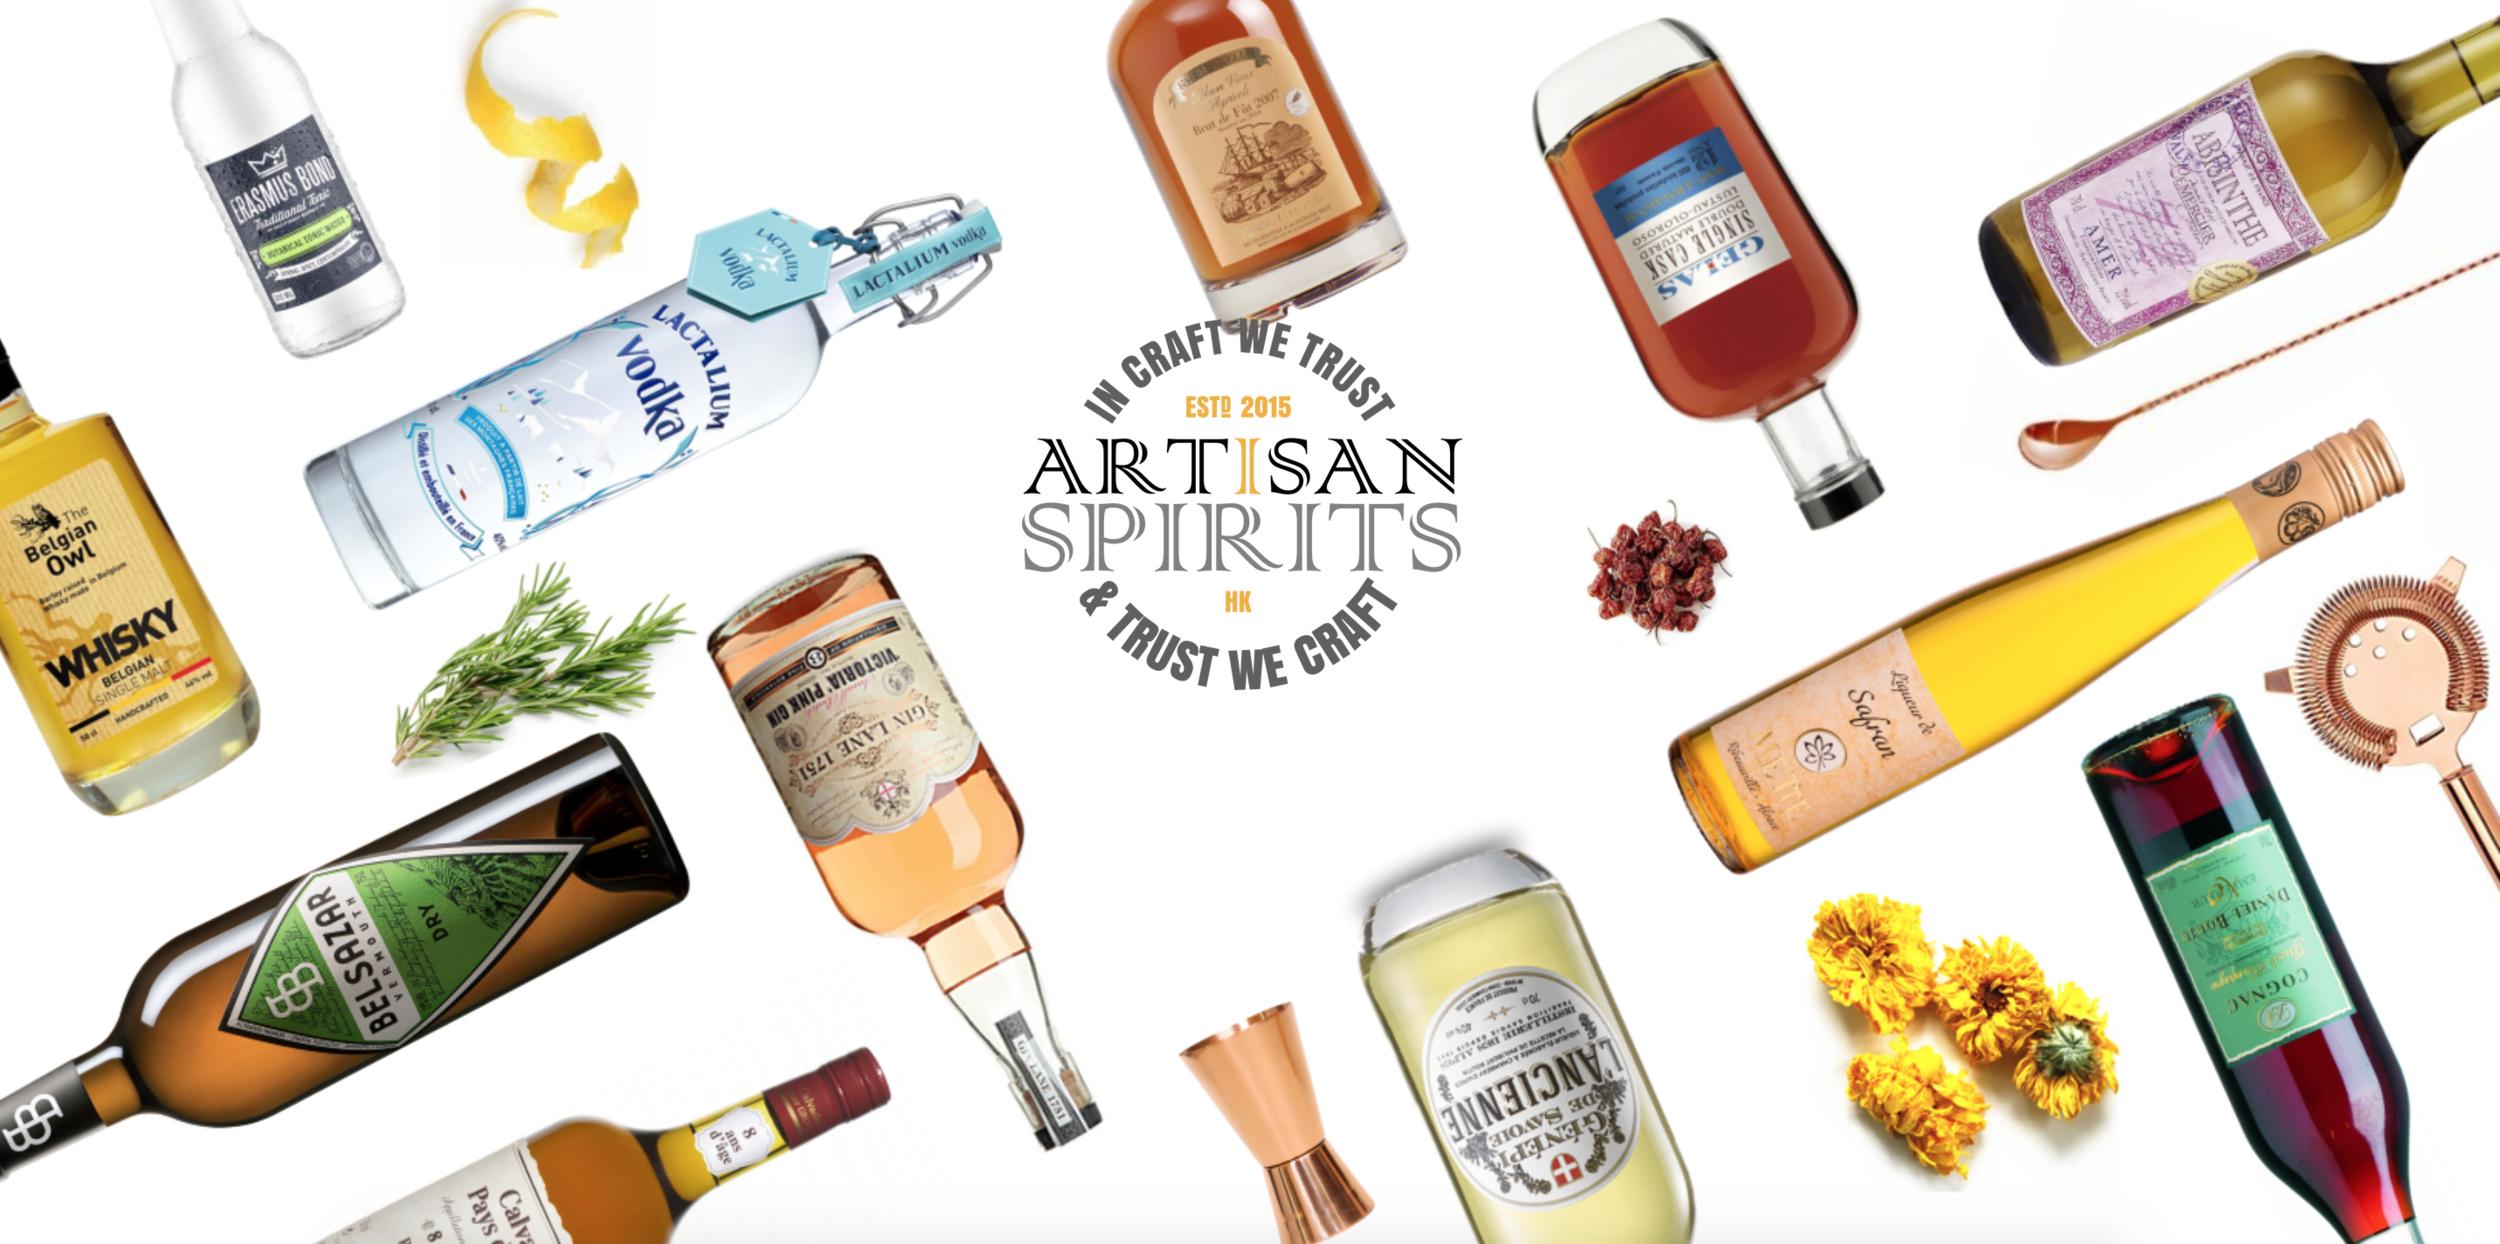 www.drink-with-spirit.com - THE ARTISAN SPIRITS